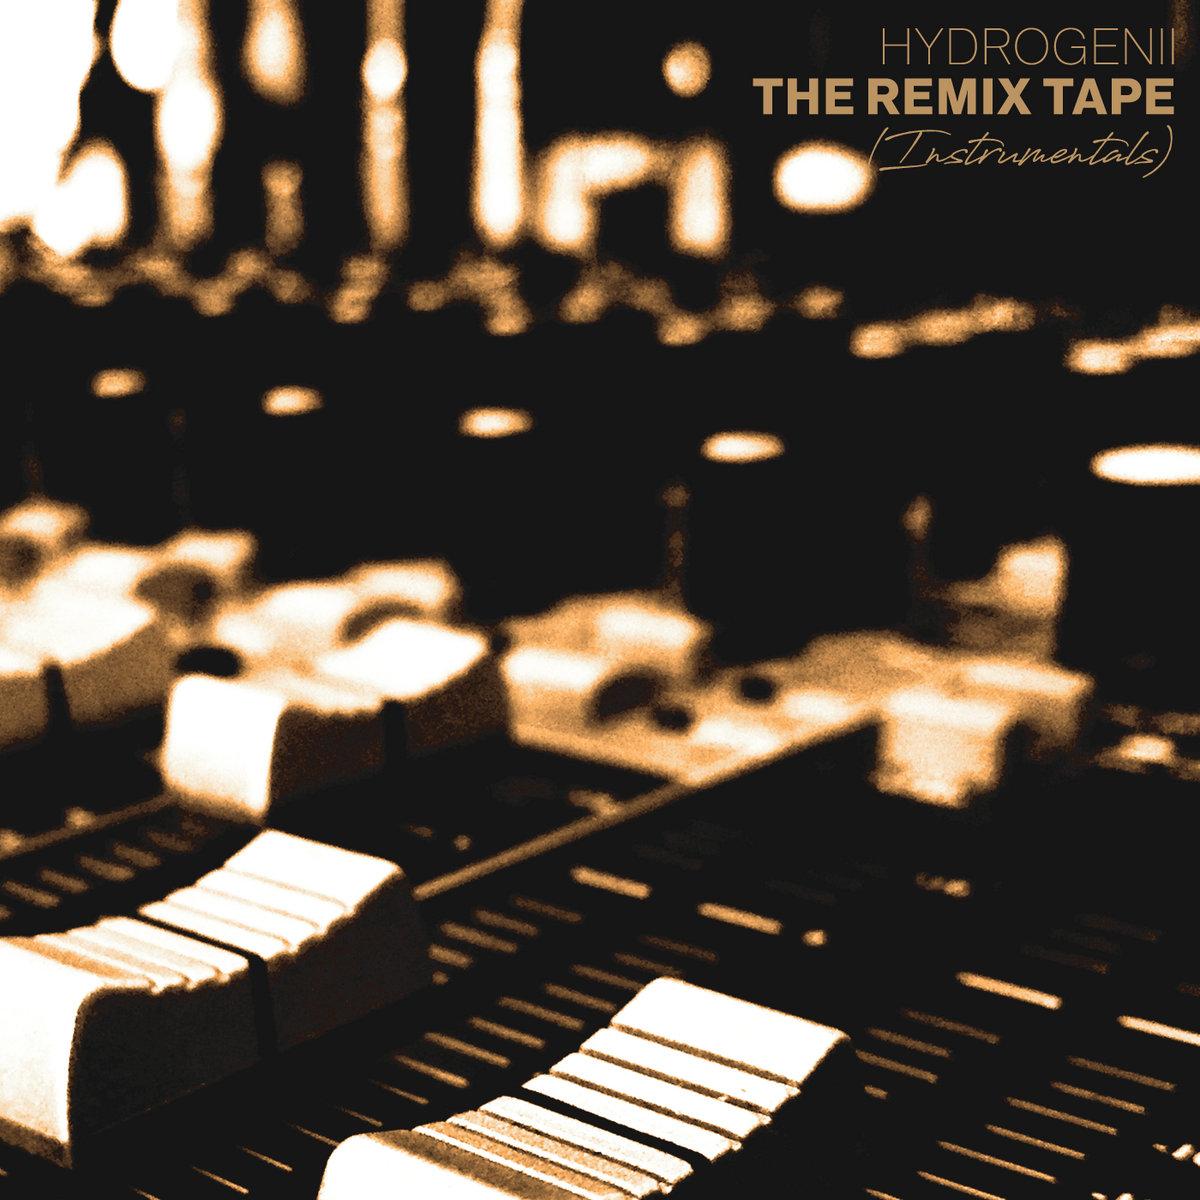 The Remix Tape (Instrumentals) | POSTPARTUM